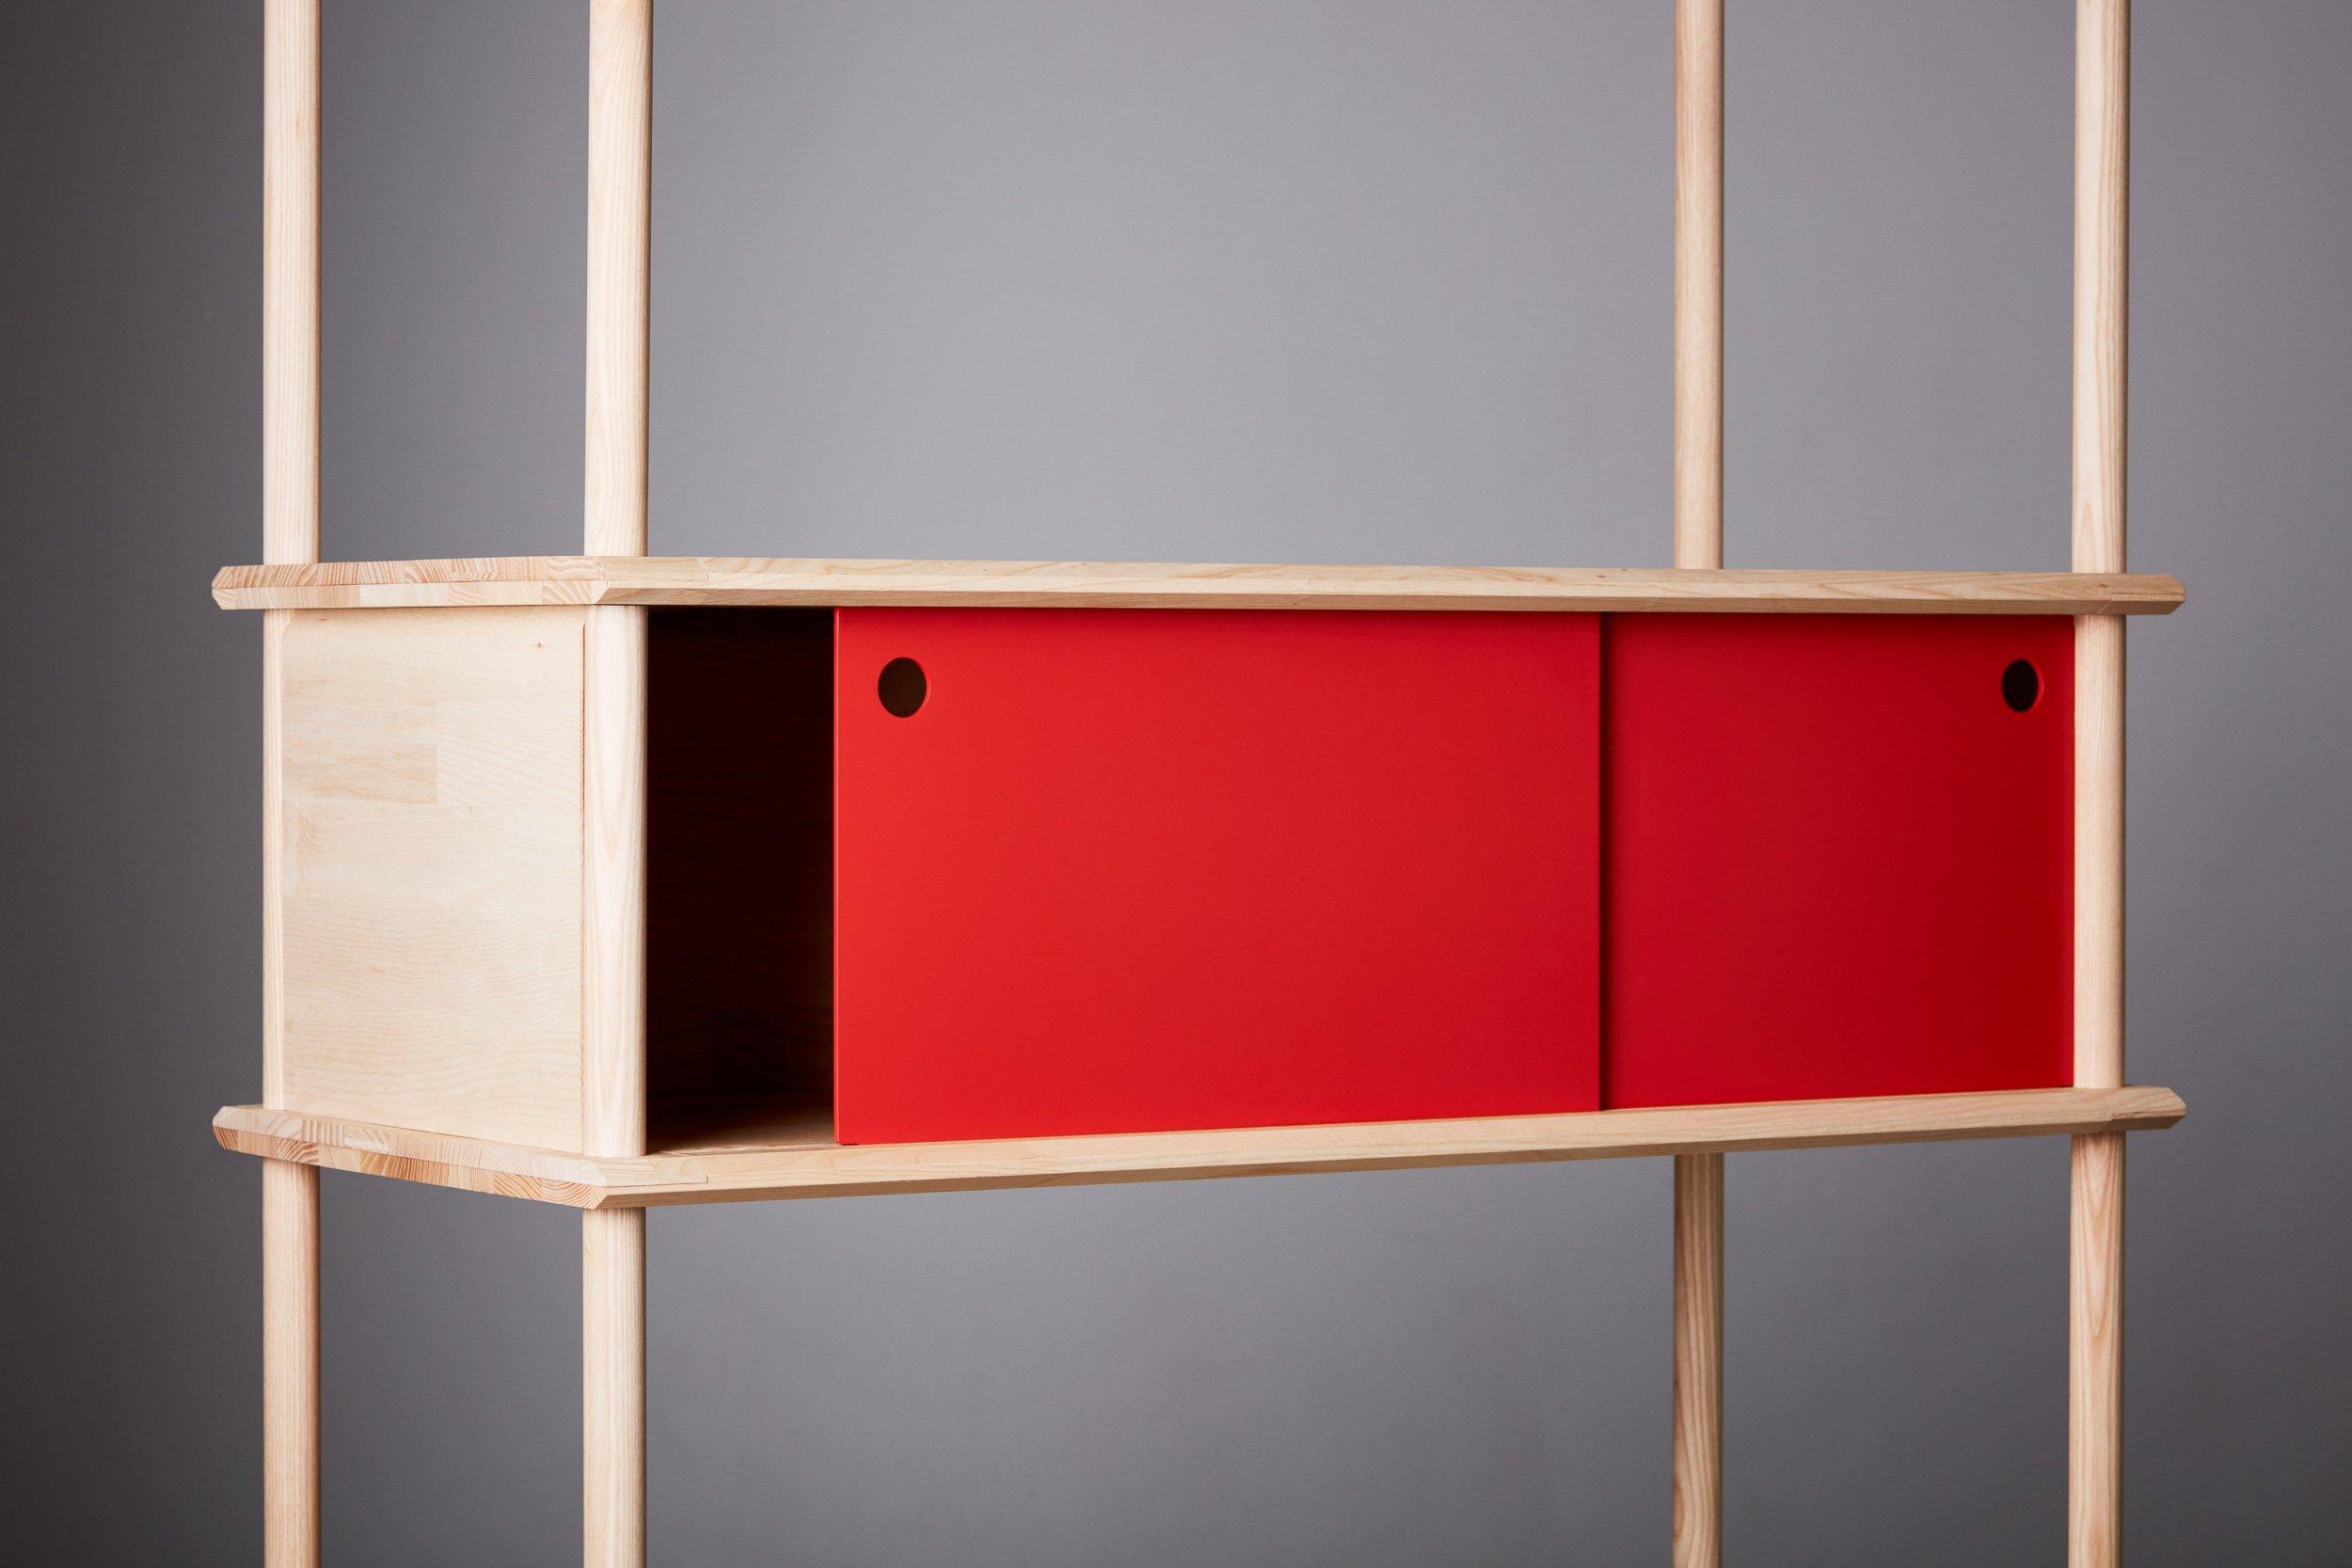 l bookcase sliding door wooden bookshelf doors bookcases white rectangle with glass org priceless handballtunisie